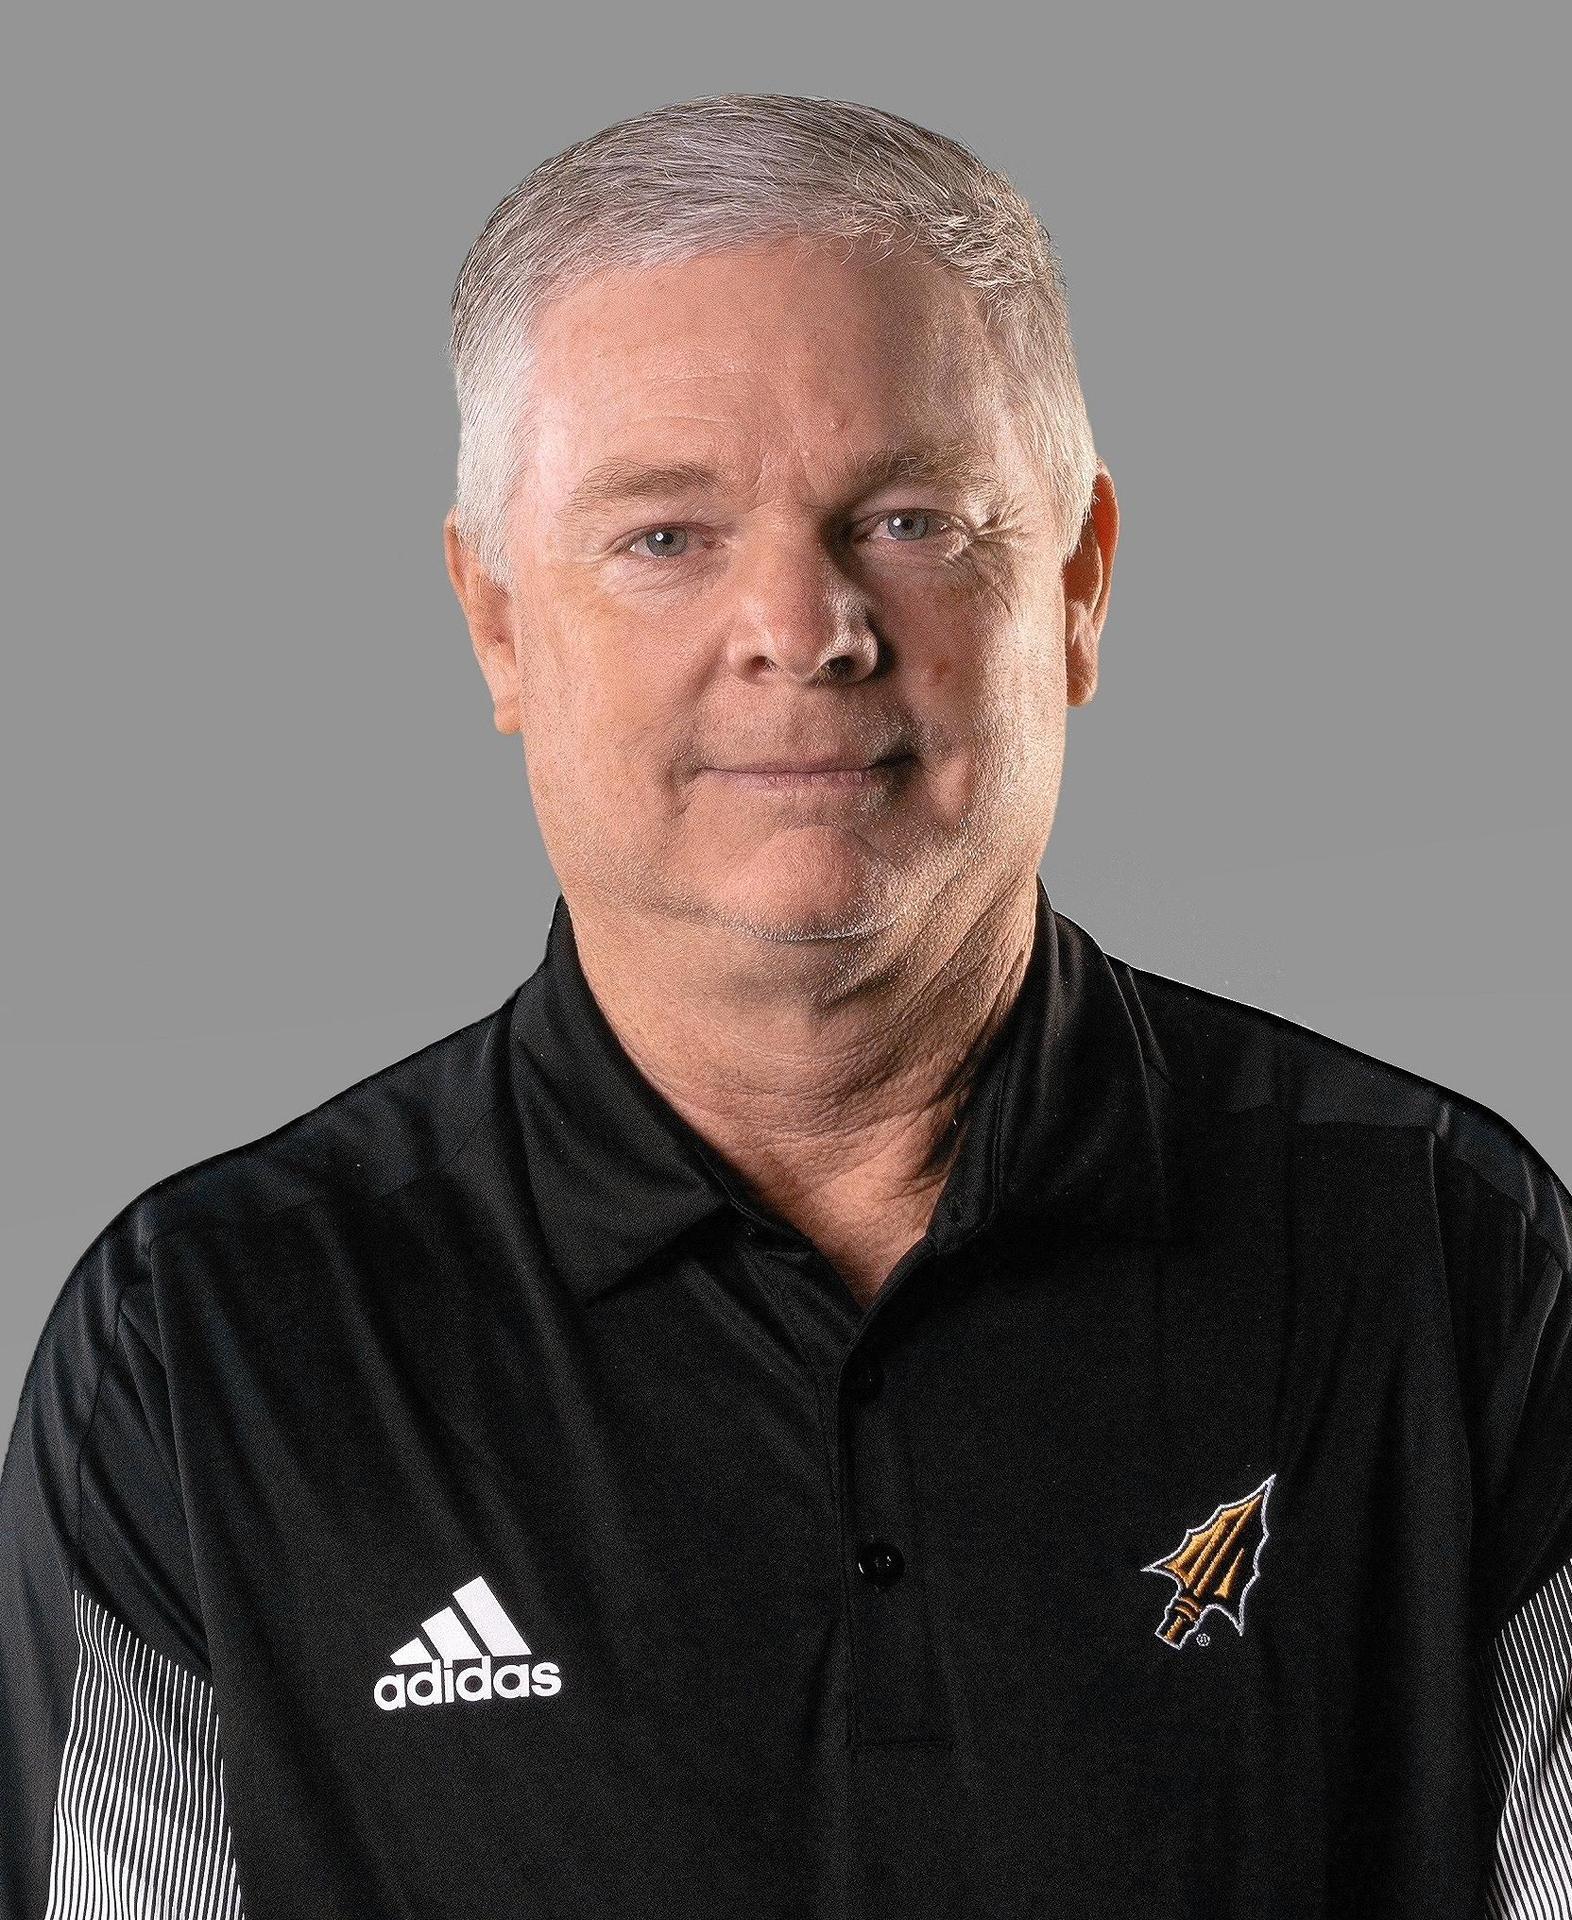 coach poynor